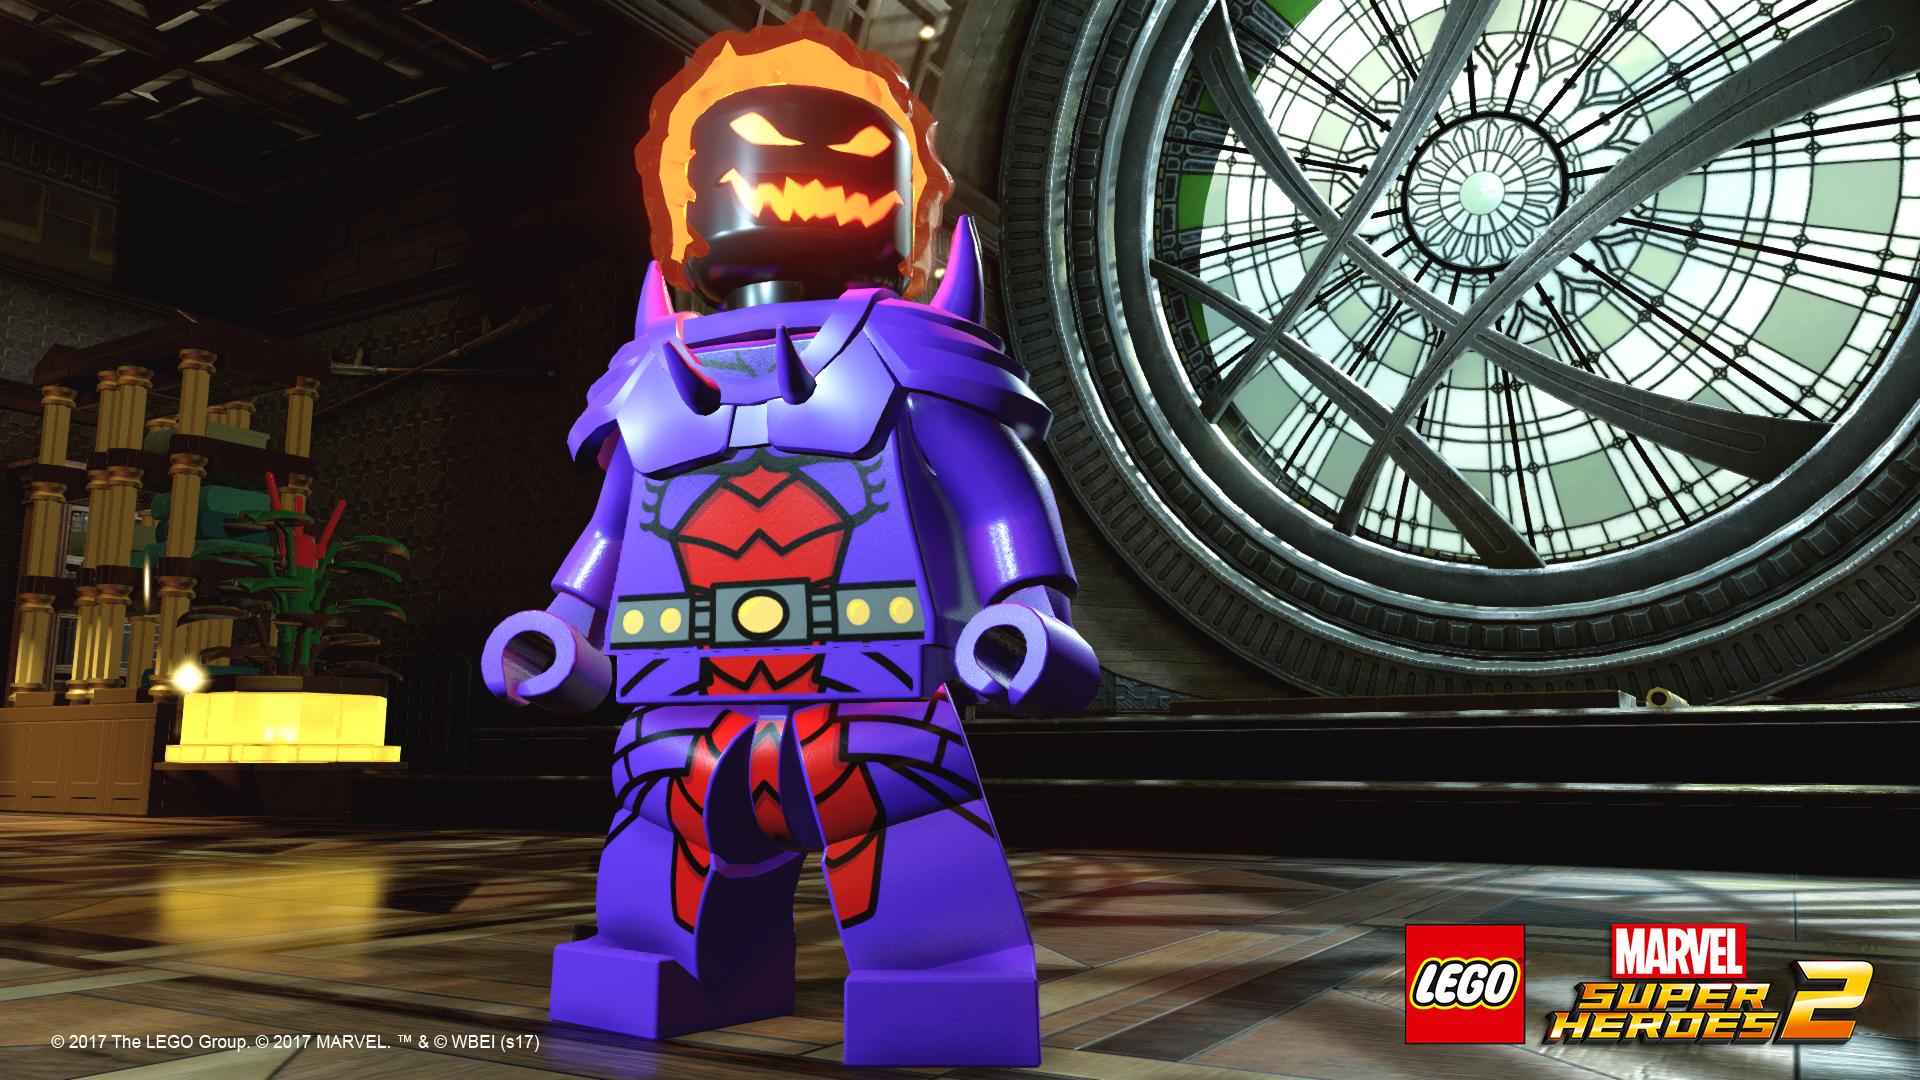 LEGO_Marvel_Super_Heroes_2_-_Dormammu_1507794990